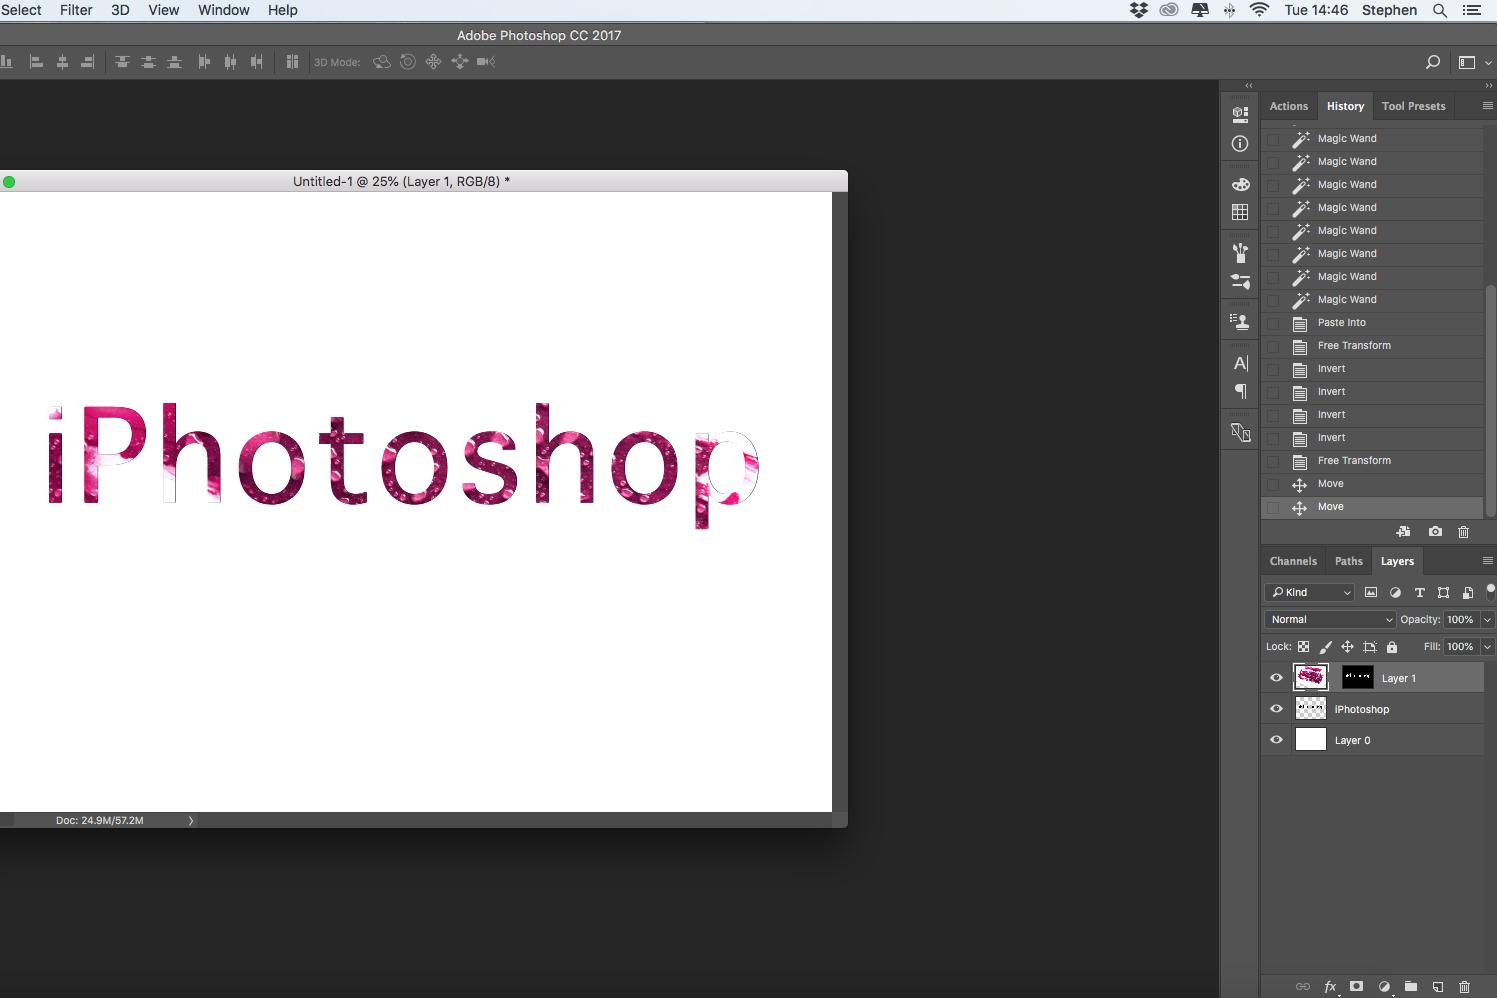 photoshop logo iphotoshop texture pink screen capture editing